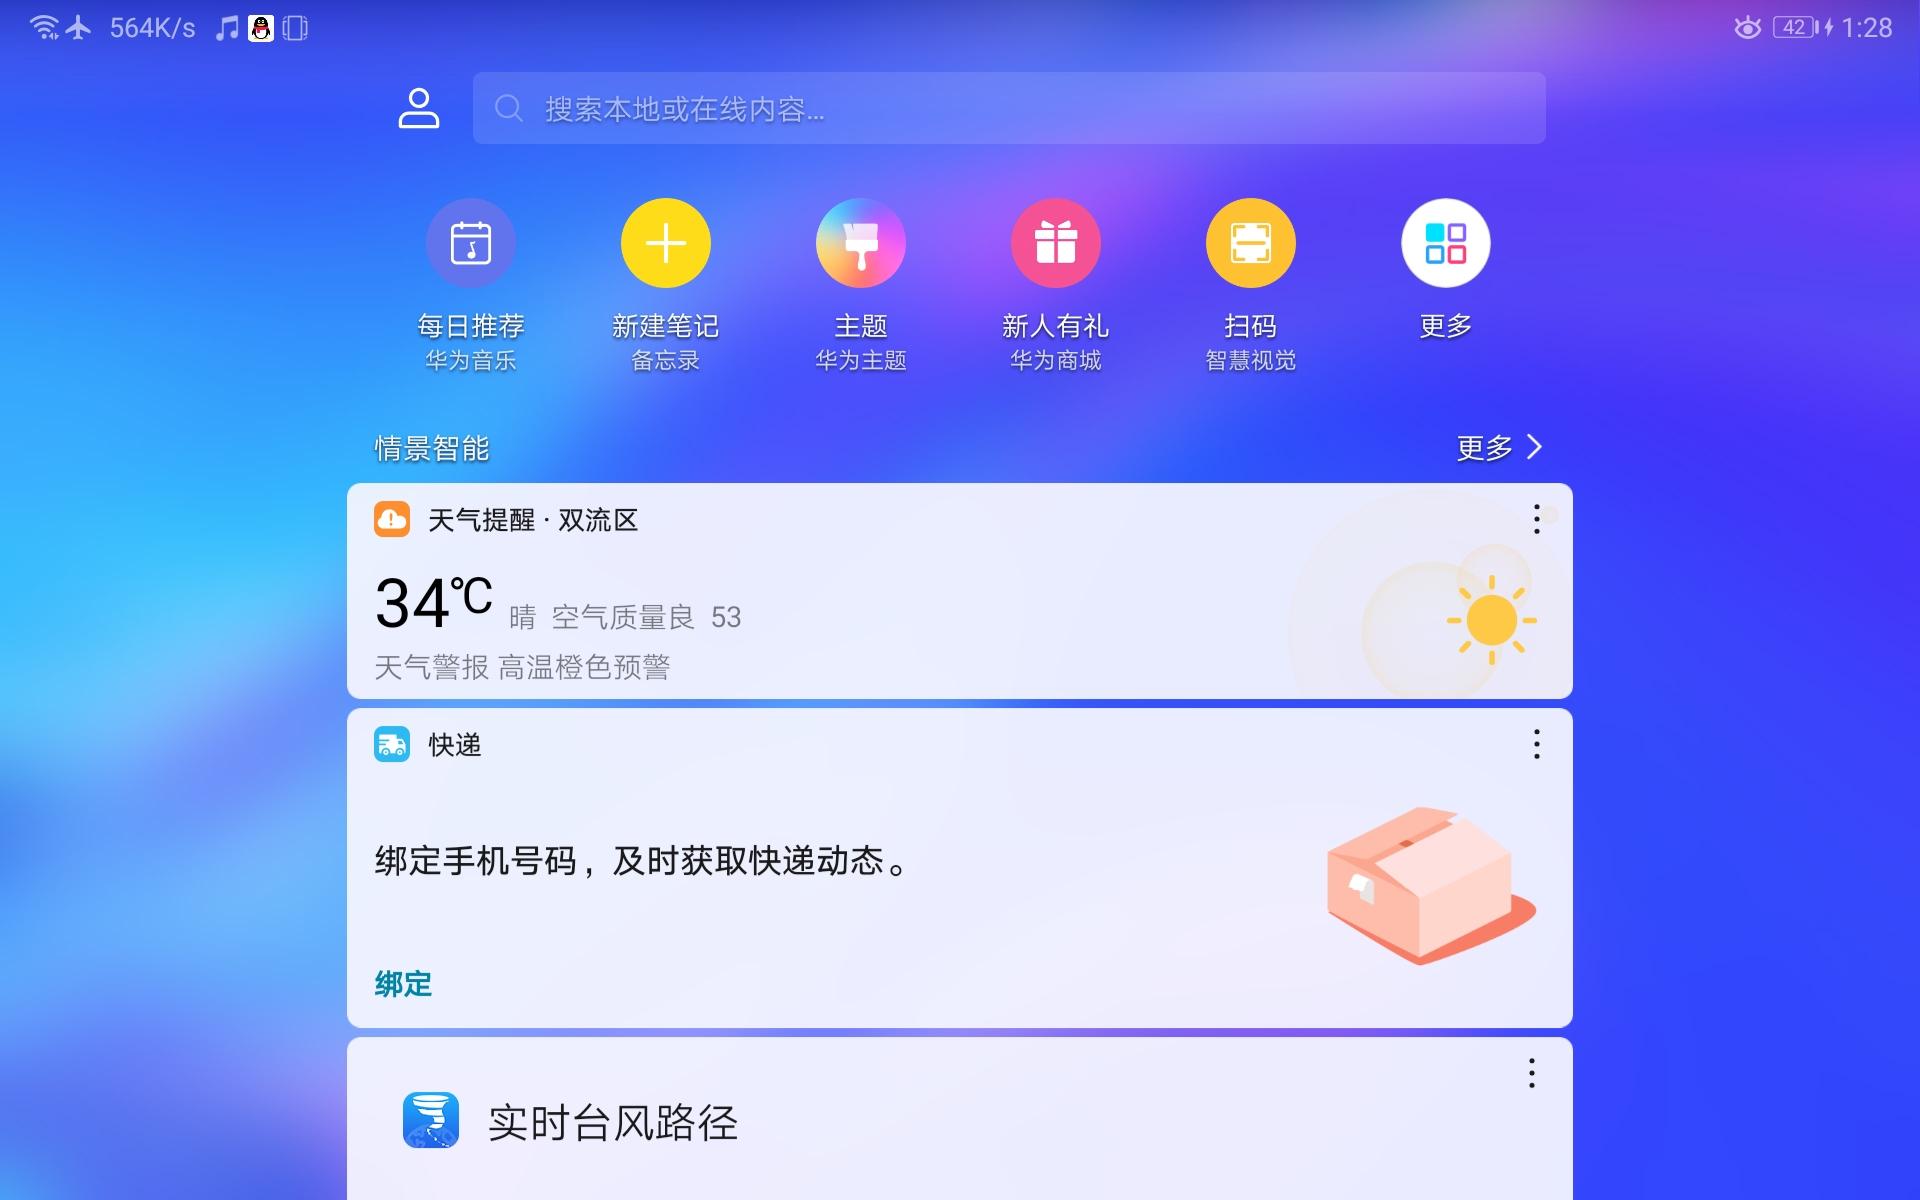 Screenshot_20190816_132800_com.huawei.android.lau.jpg